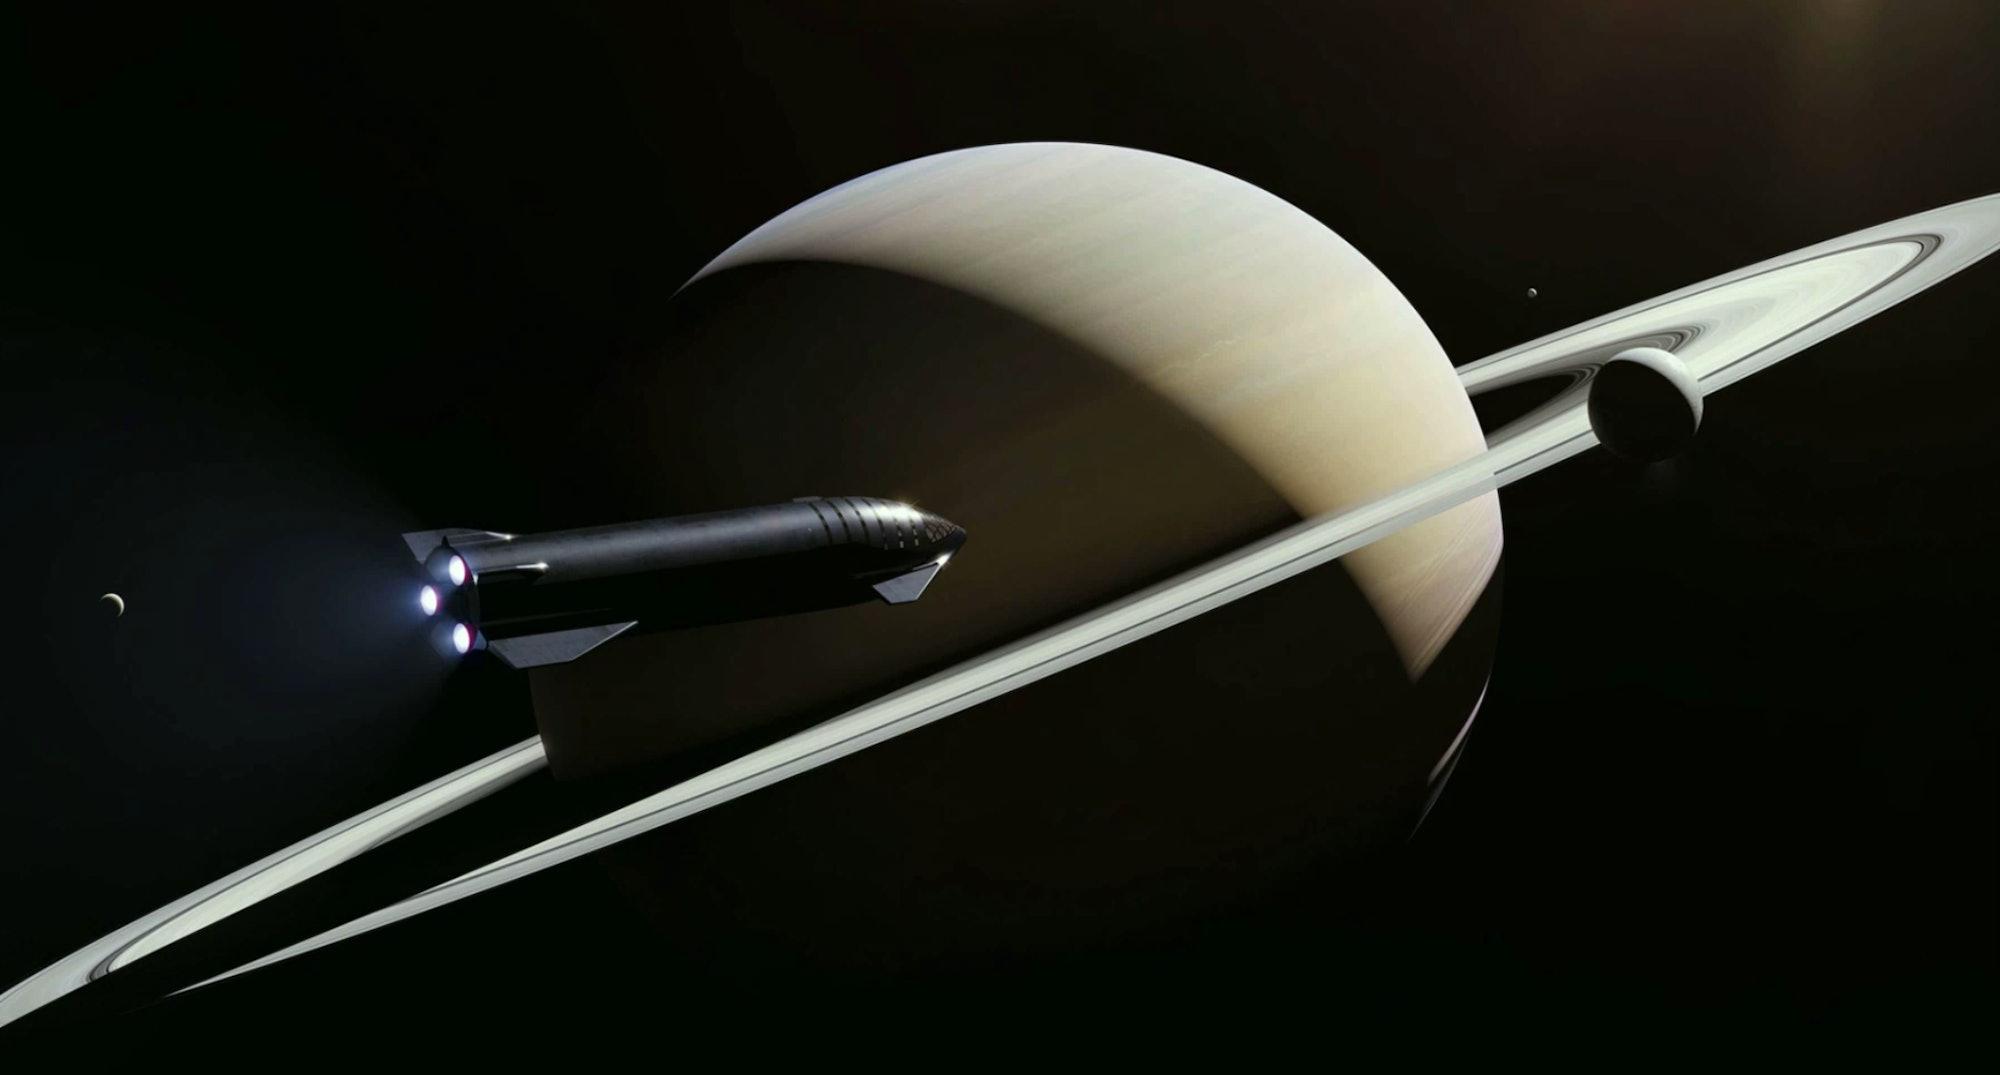 An artist's rendering of Starship near Saturn.